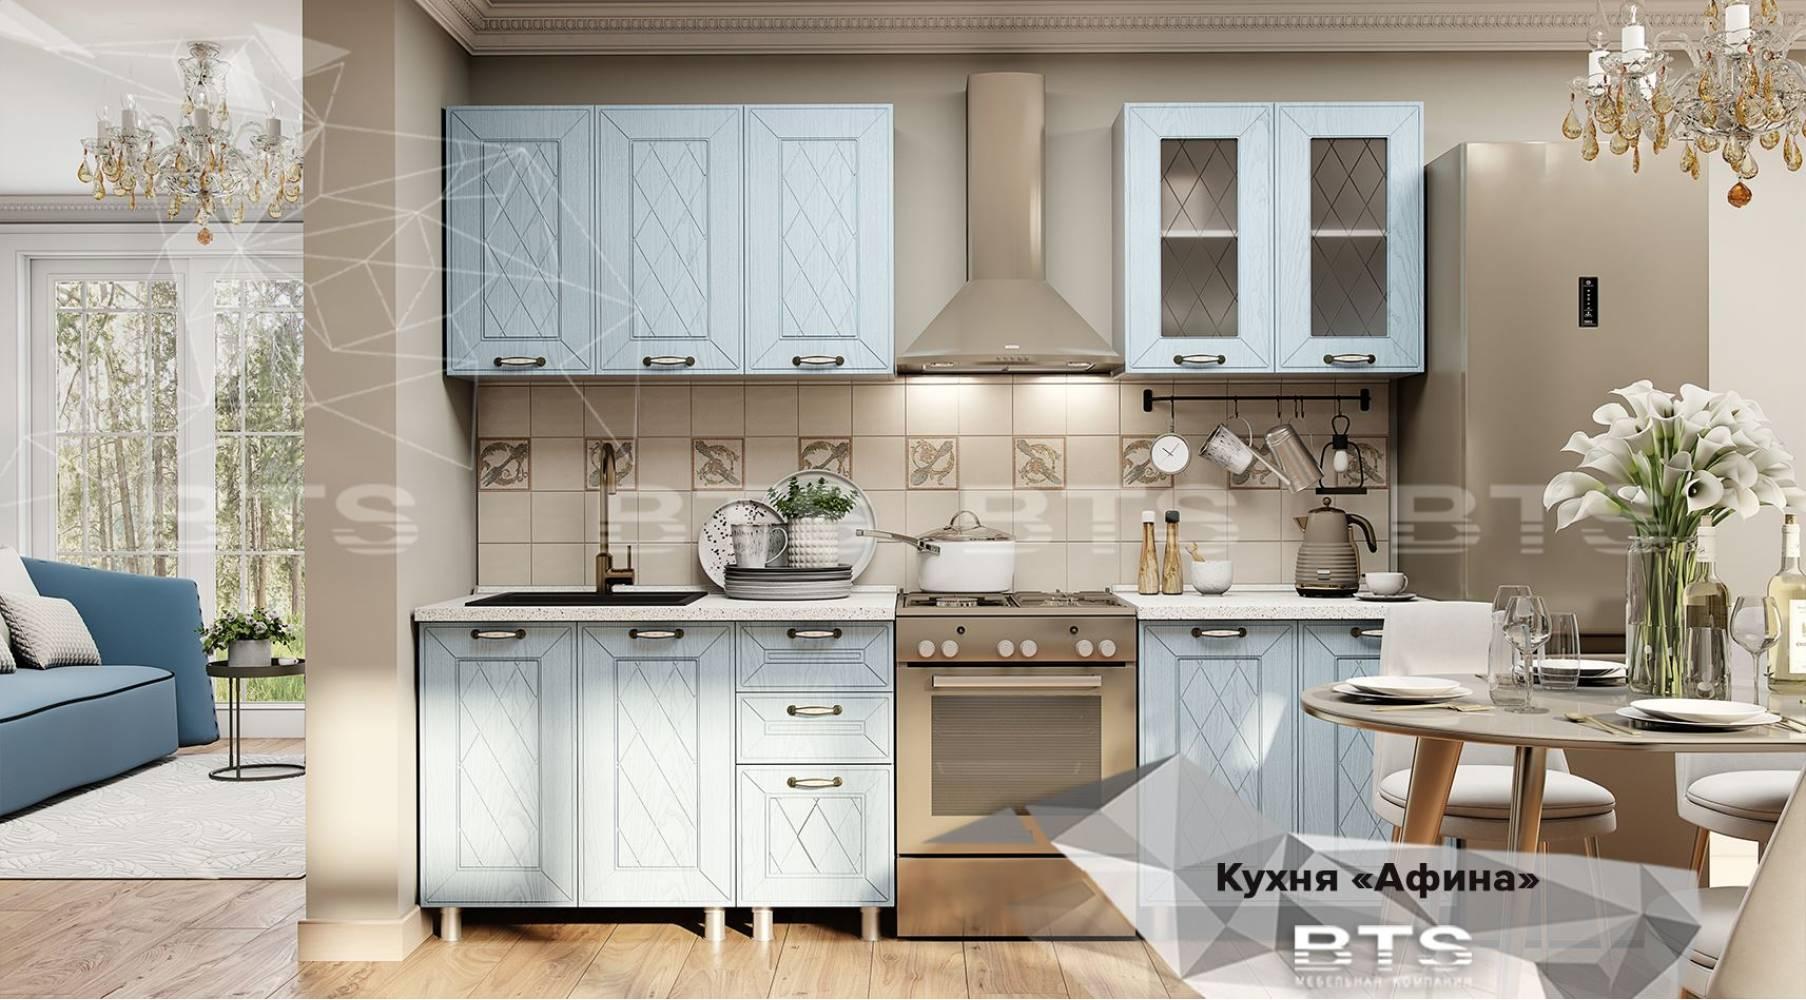 Кухня Афина арктик 2.0 м